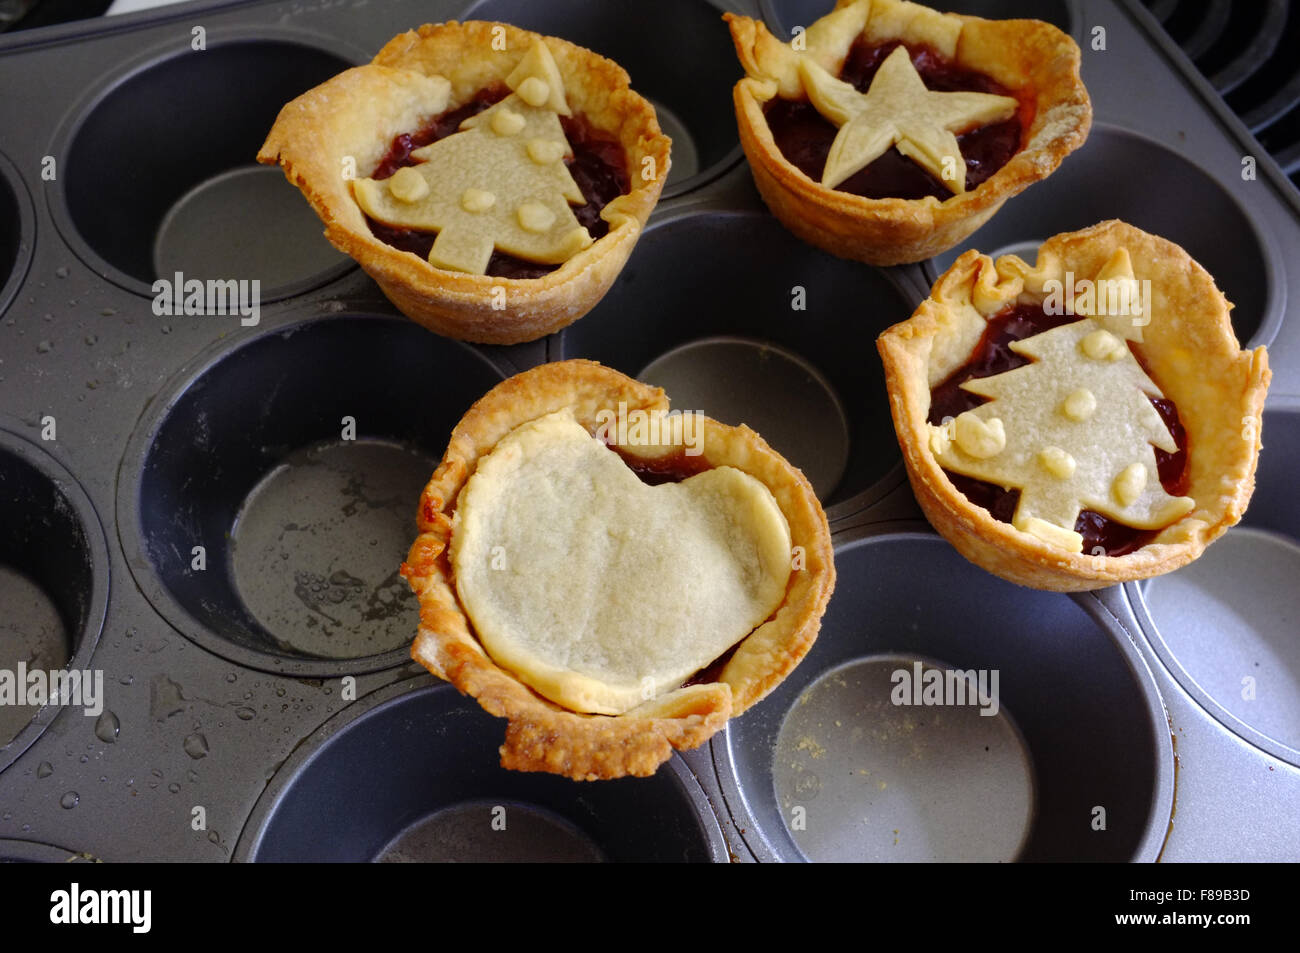 Homemade jam tarts sitting on a baking tray. - Stock Image